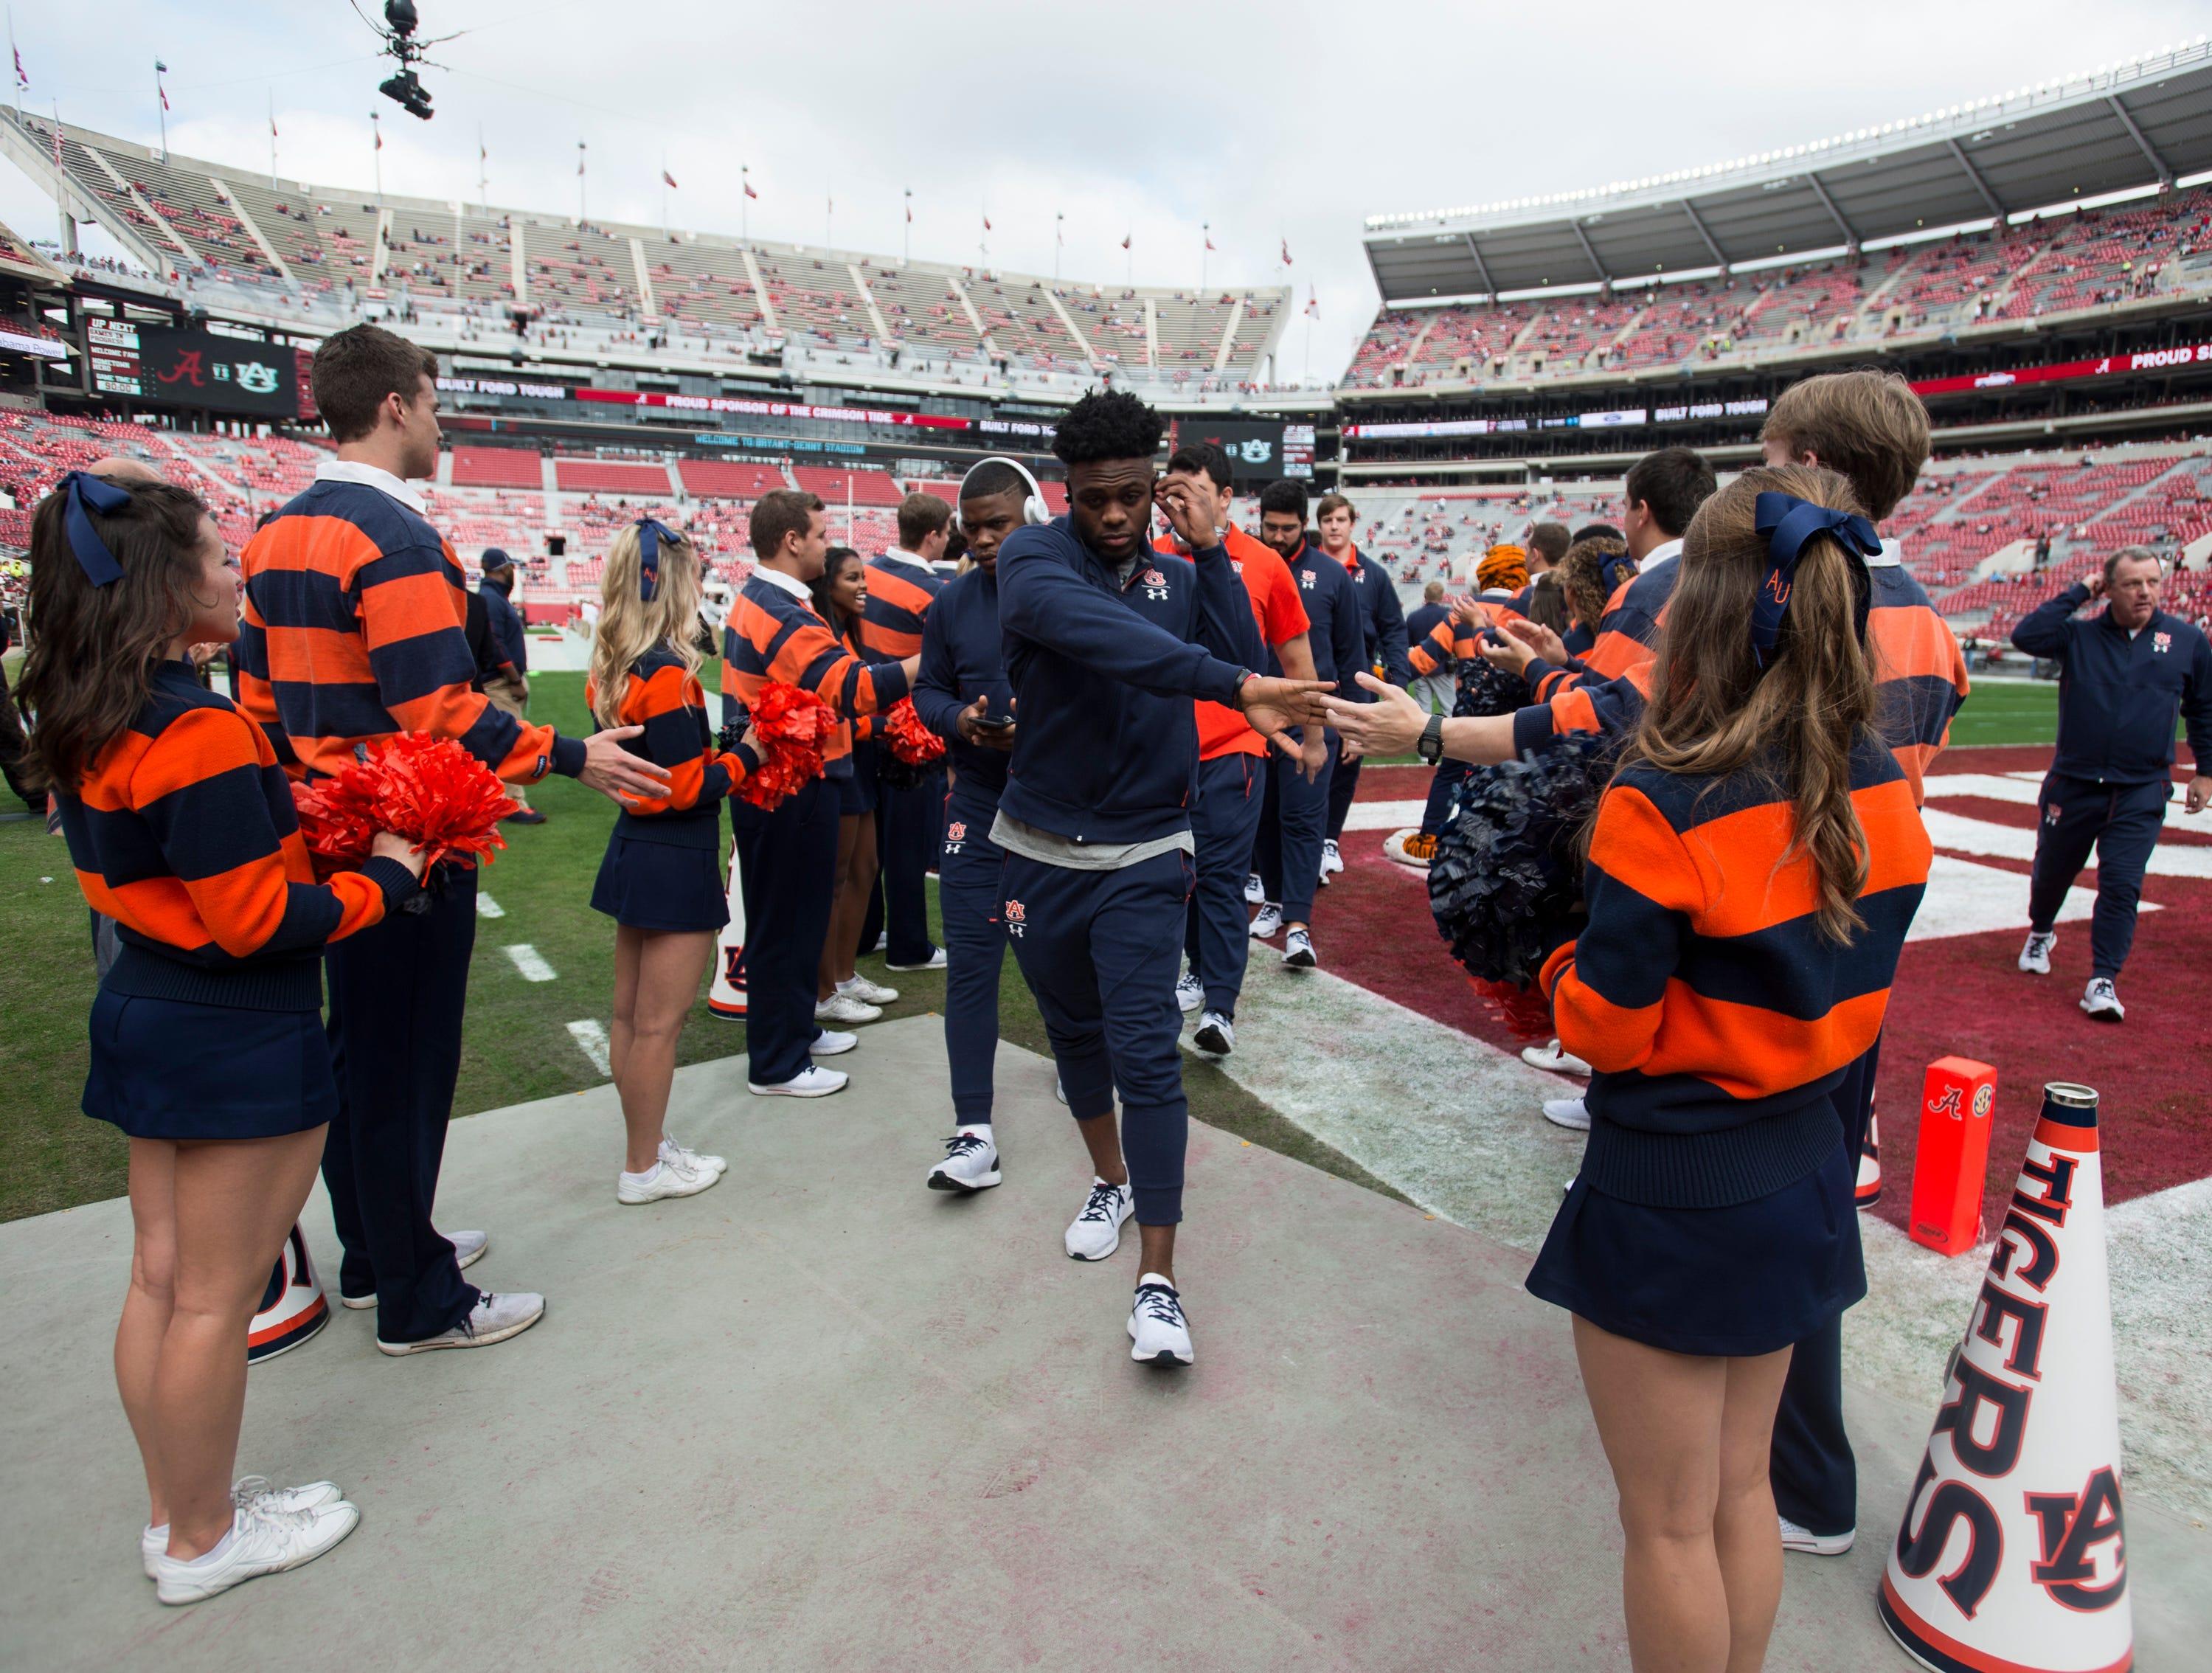 Auburn players head to the locker room at Bryant-Denny Stadium in Tuscaloosa, Ala., on Saturday, Nov. 24, 2018.